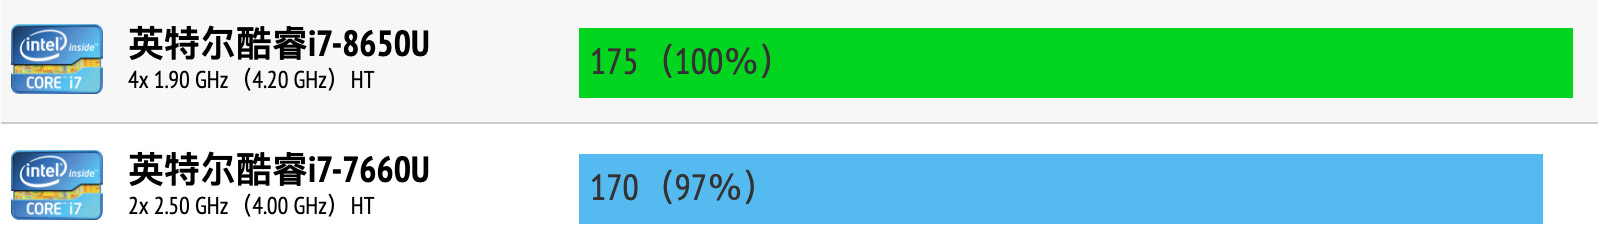 Intel Core i7-8650U和i7-7660U性能跑分对比评测